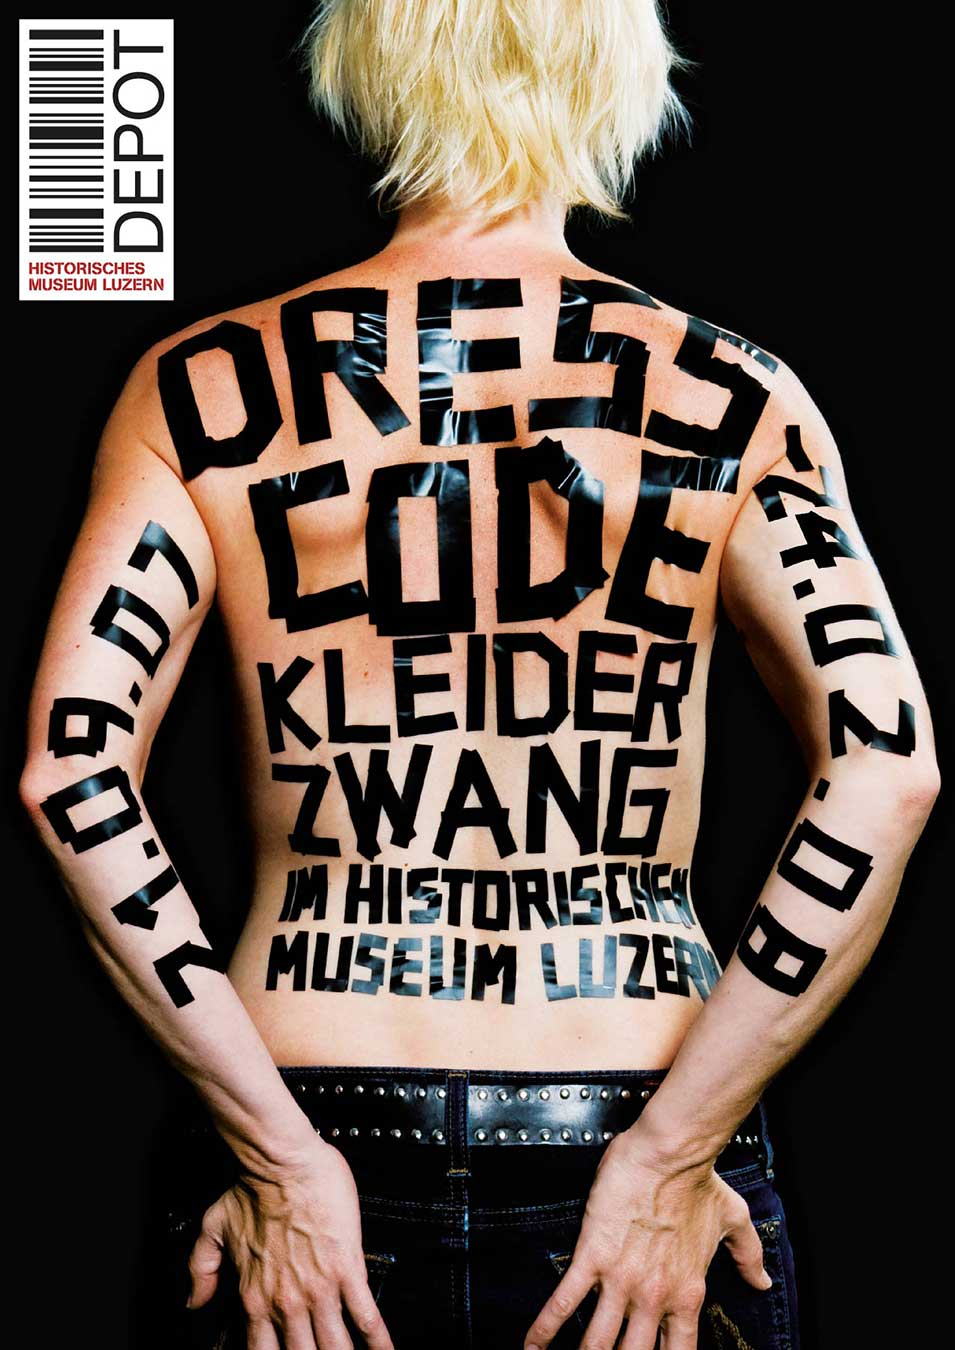 Historisches Museum Plakat Ausstellung Werbung